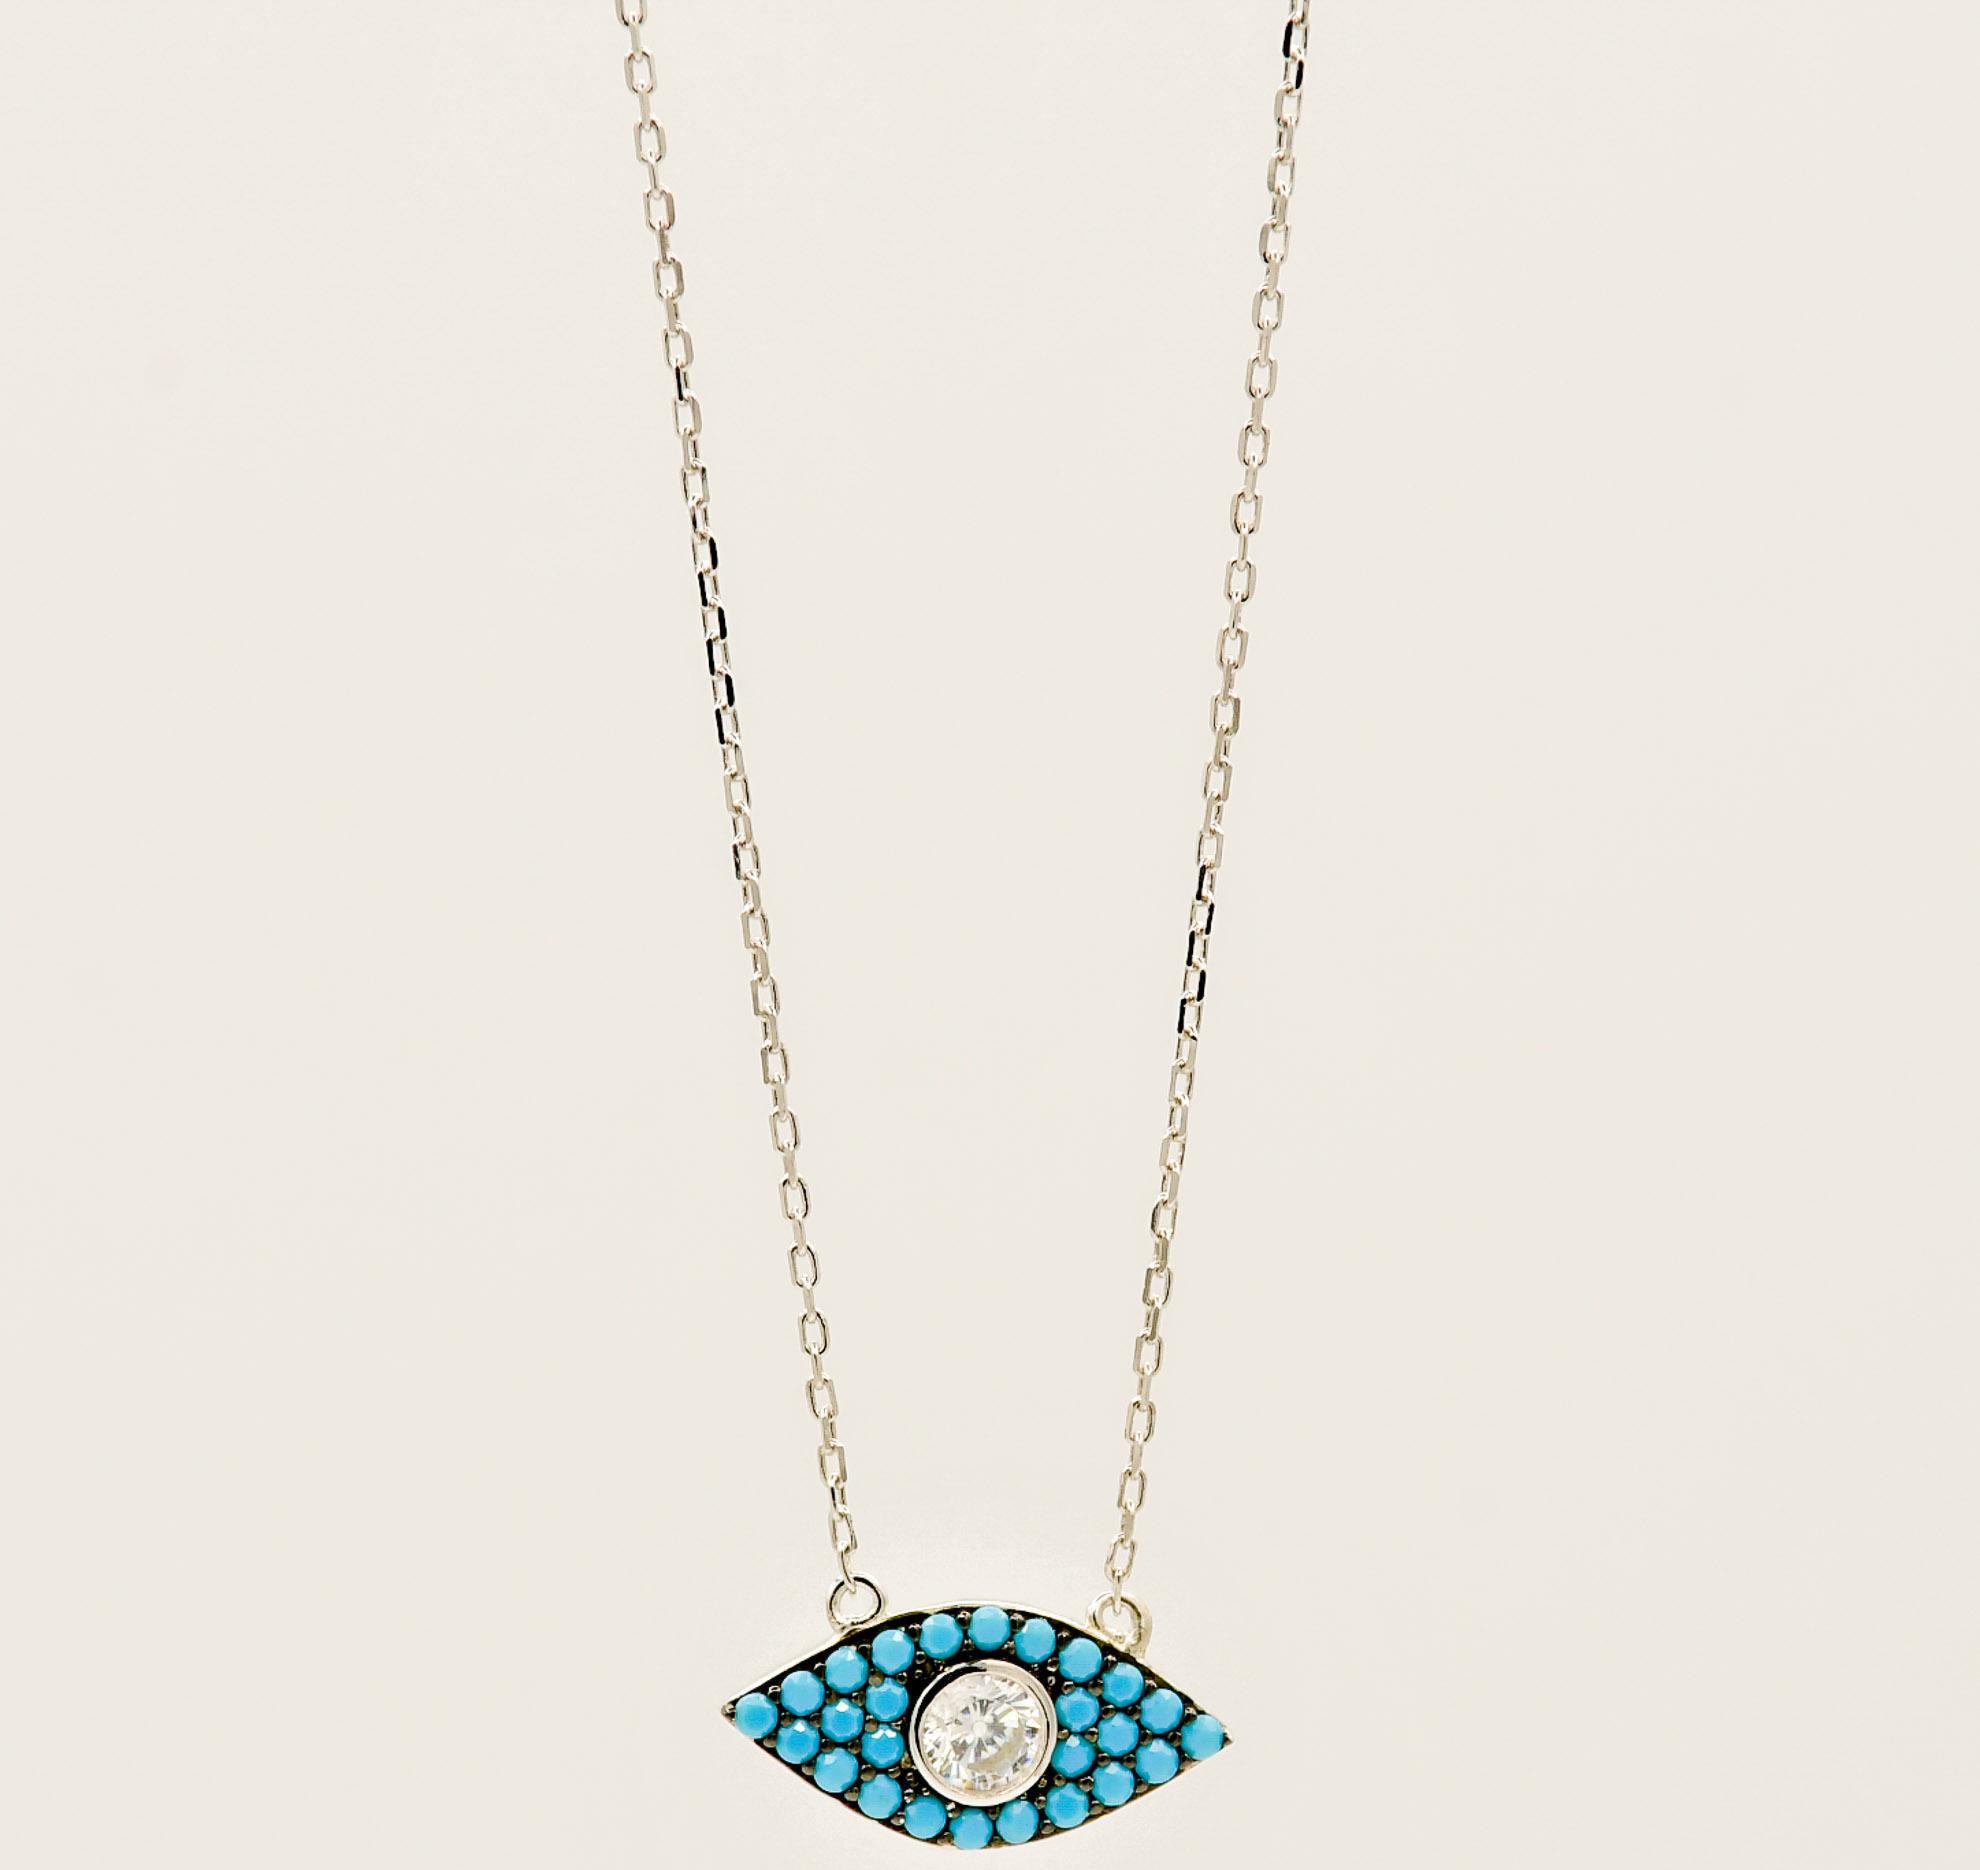 Lucky Eye Necklace Necklace 3